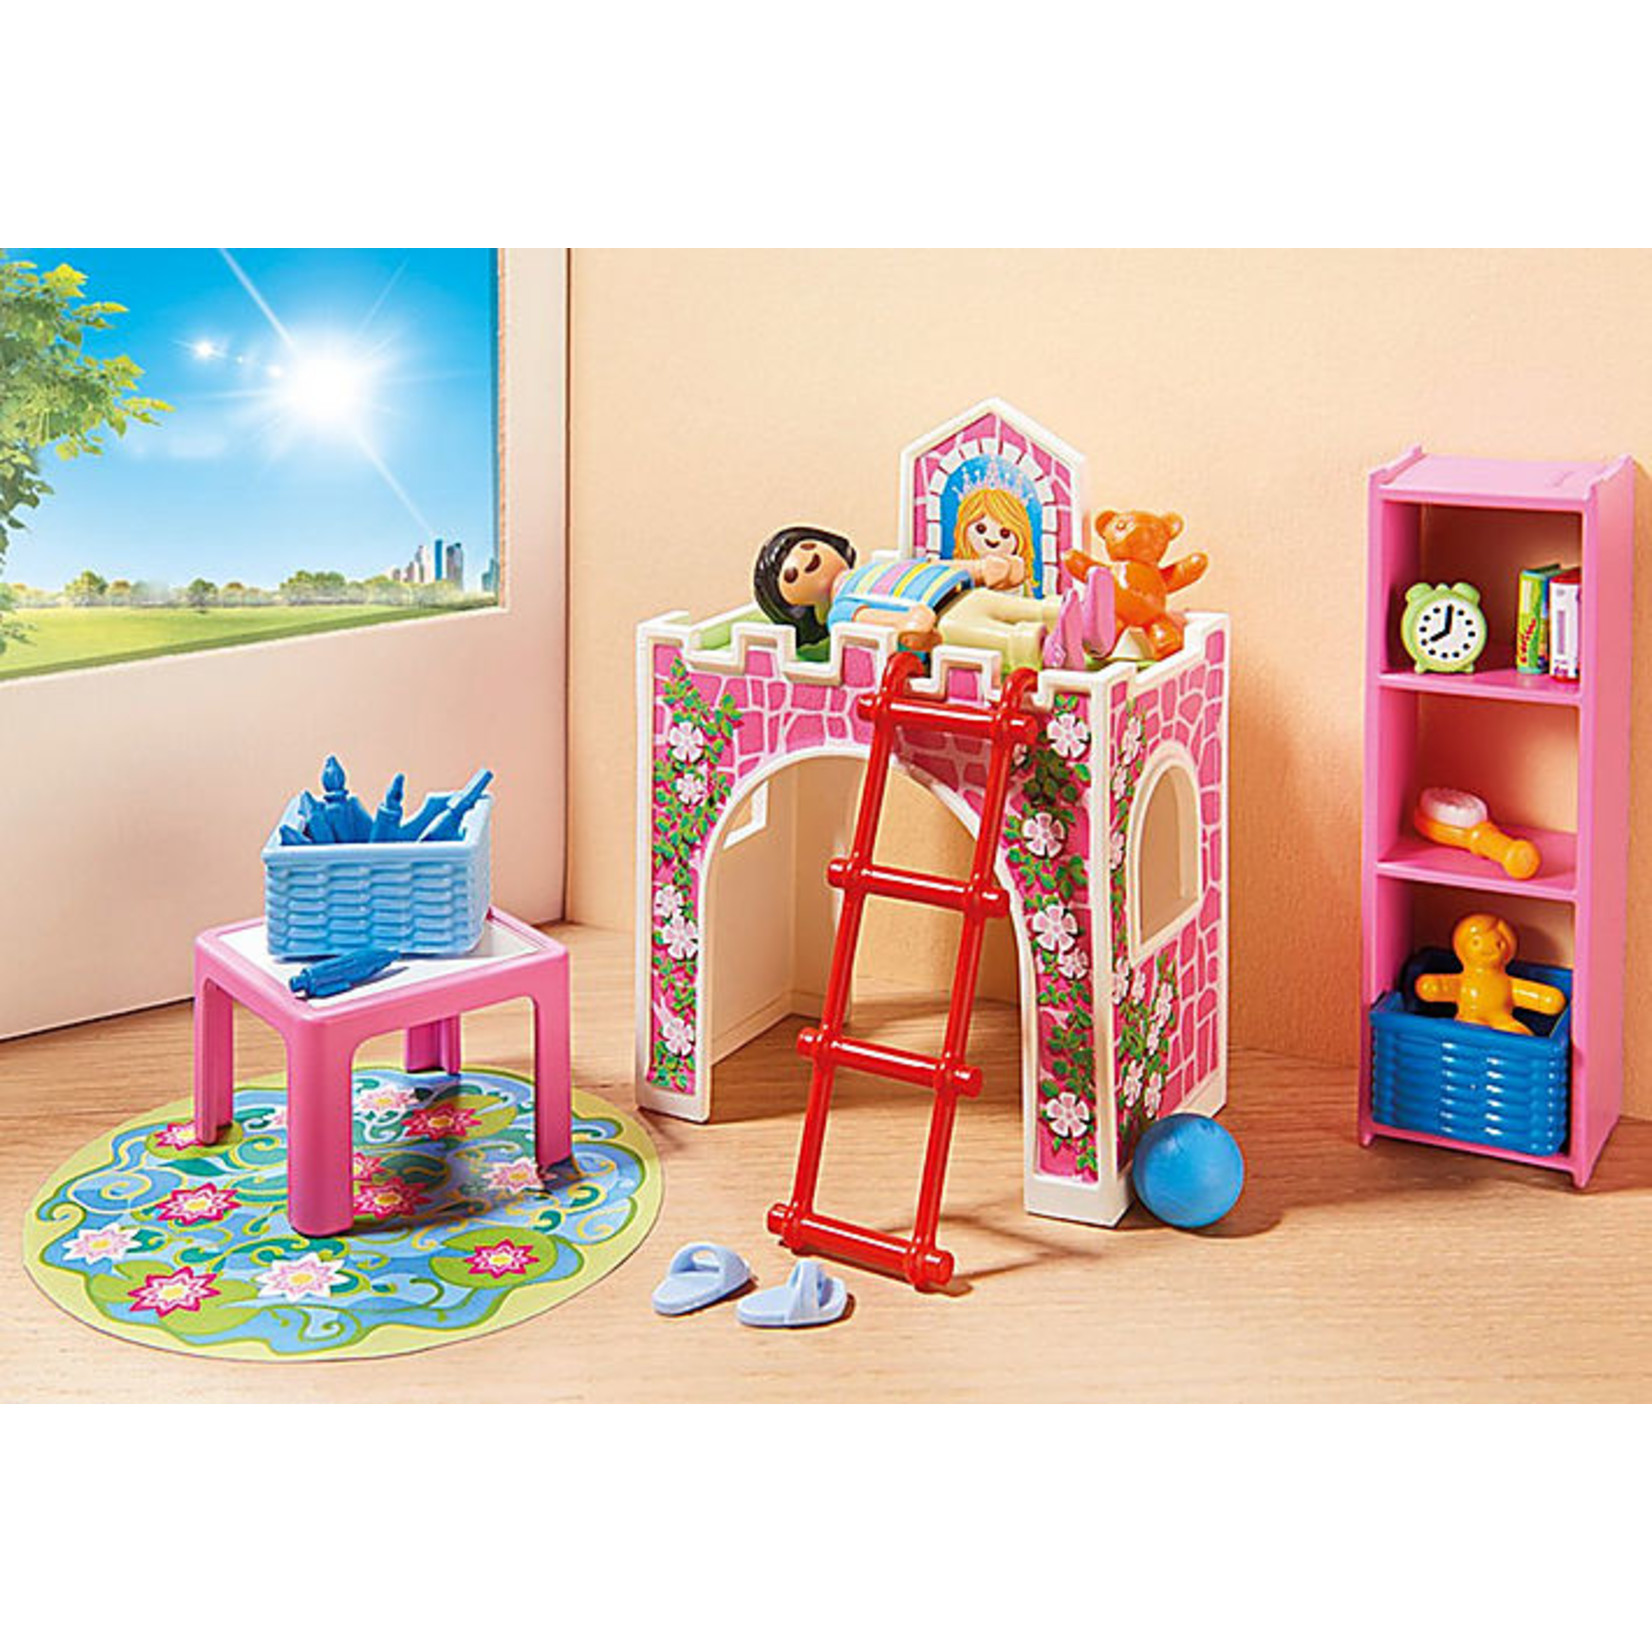 PLAYMOBIL CHILDRENS ROOM